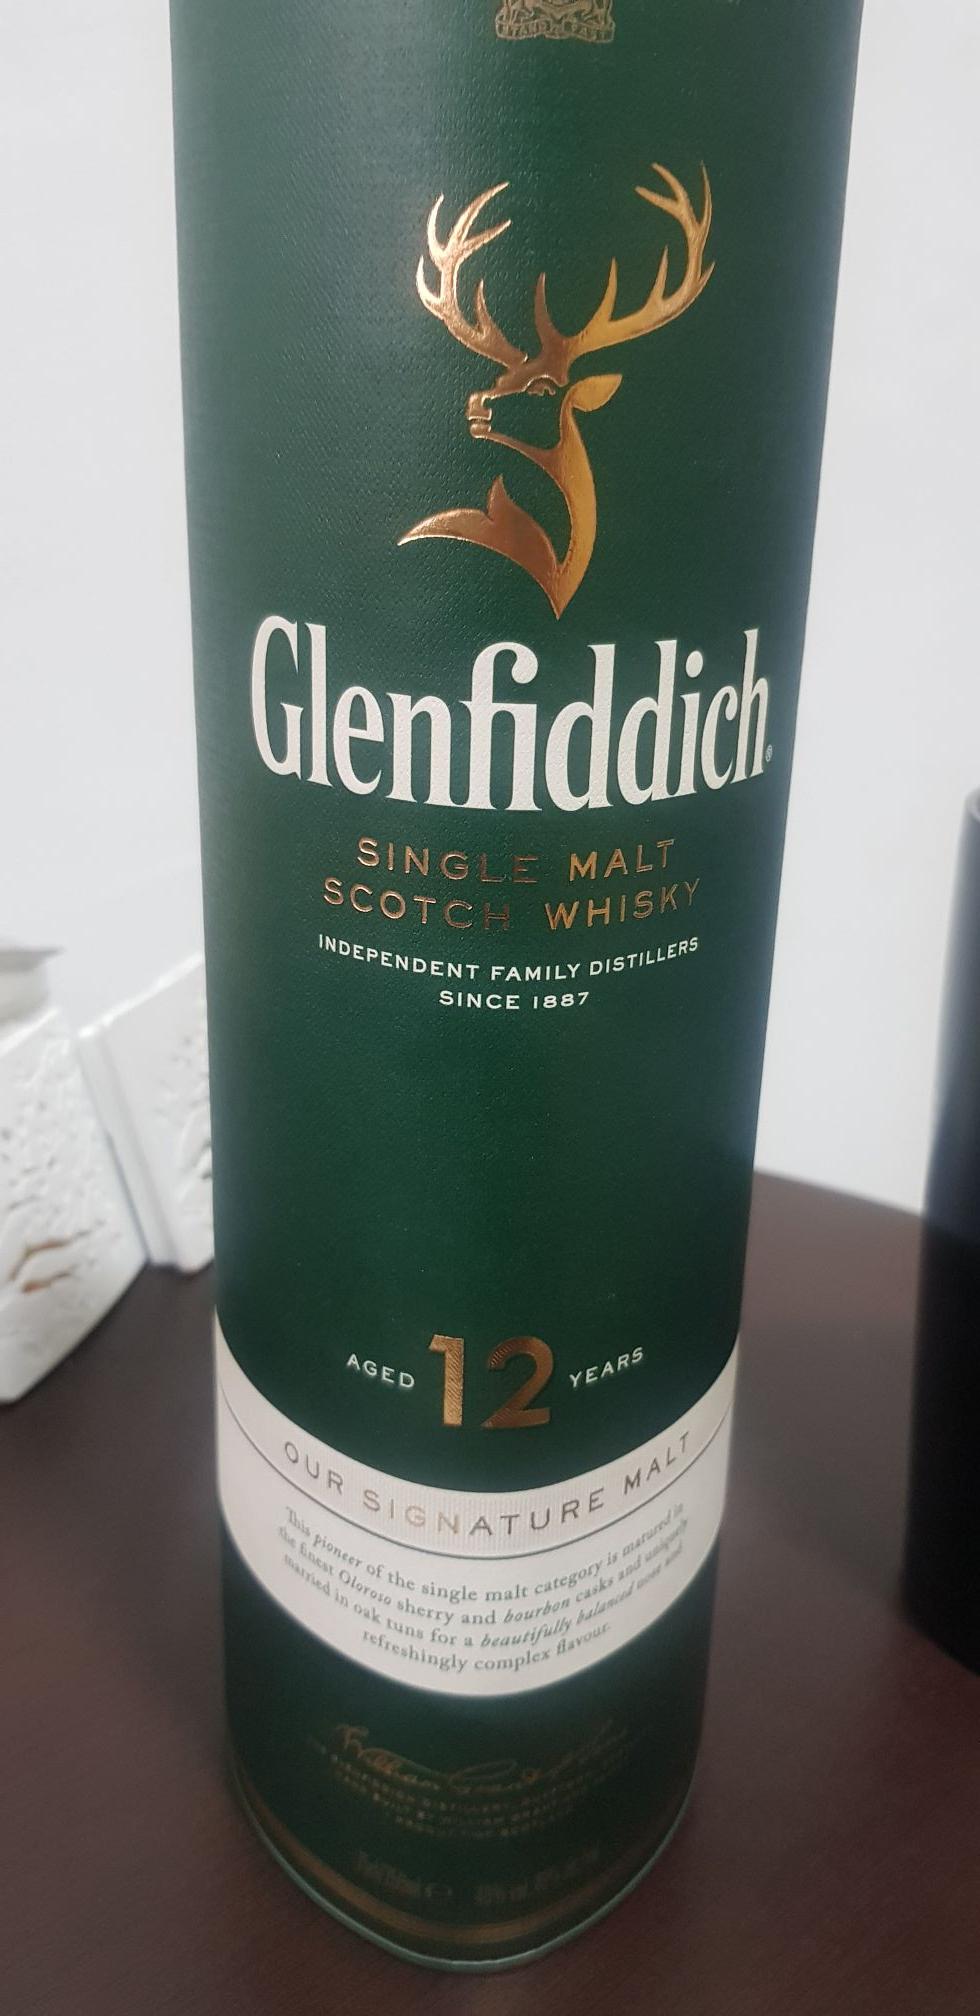 Oxxo. Glenfiddich 12 rebajado en oxxo CDMX coyoacan